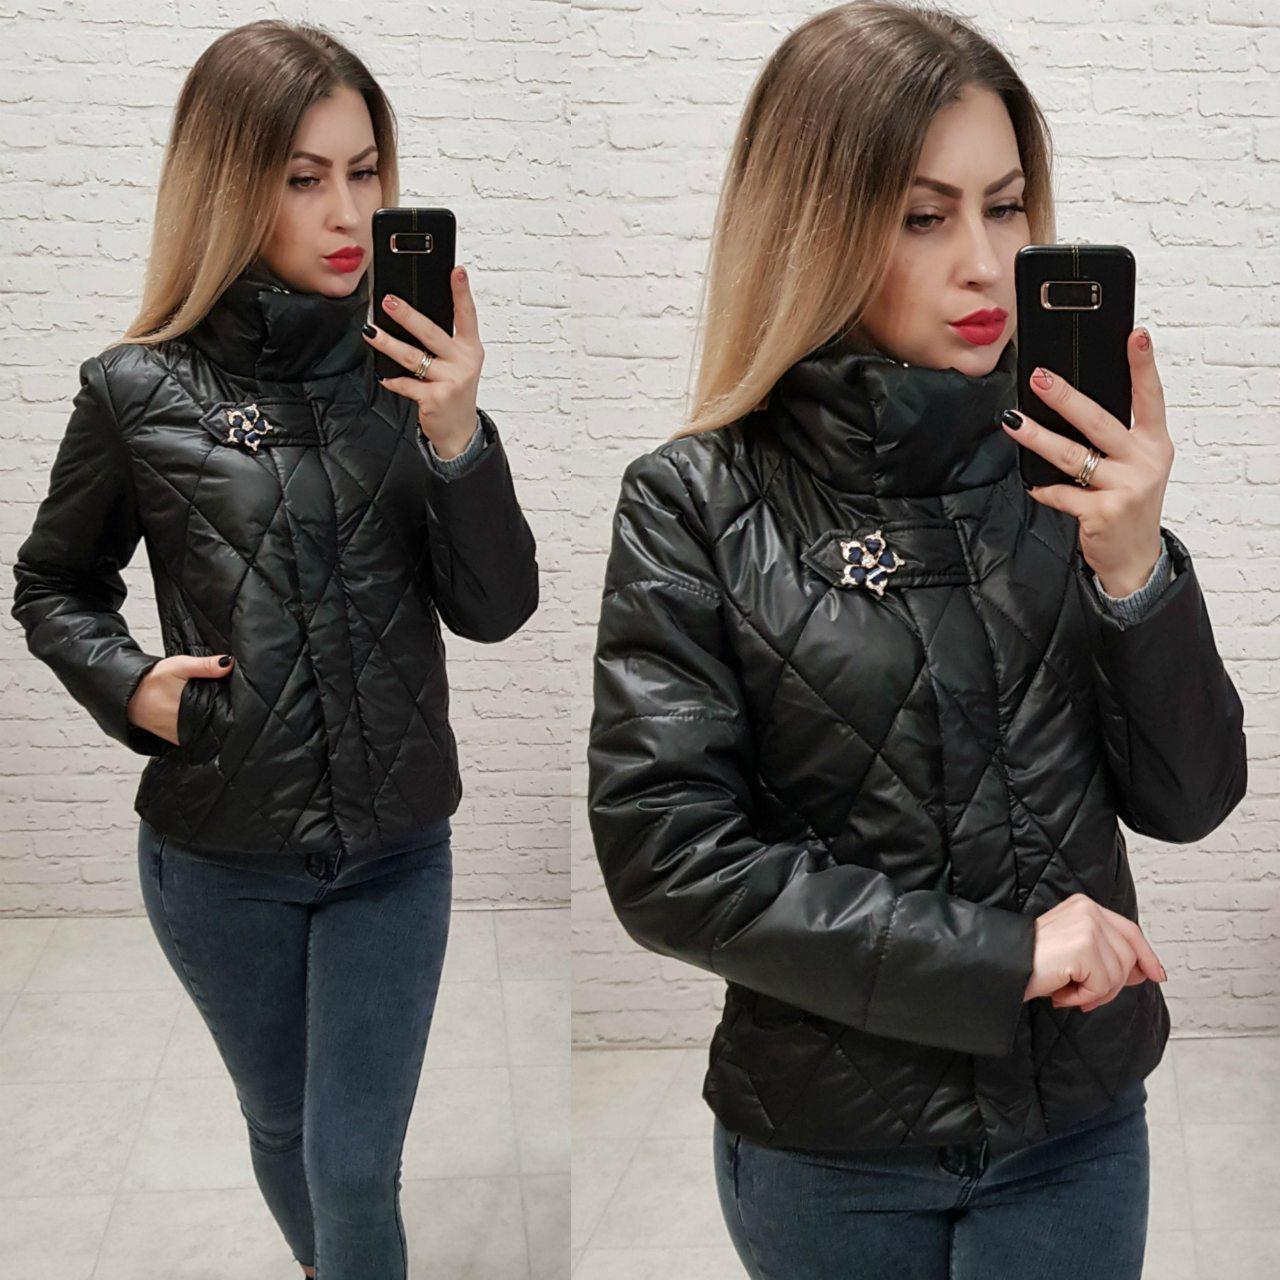 b83009e1bd8 Новинка! Женственная куртка с брошью